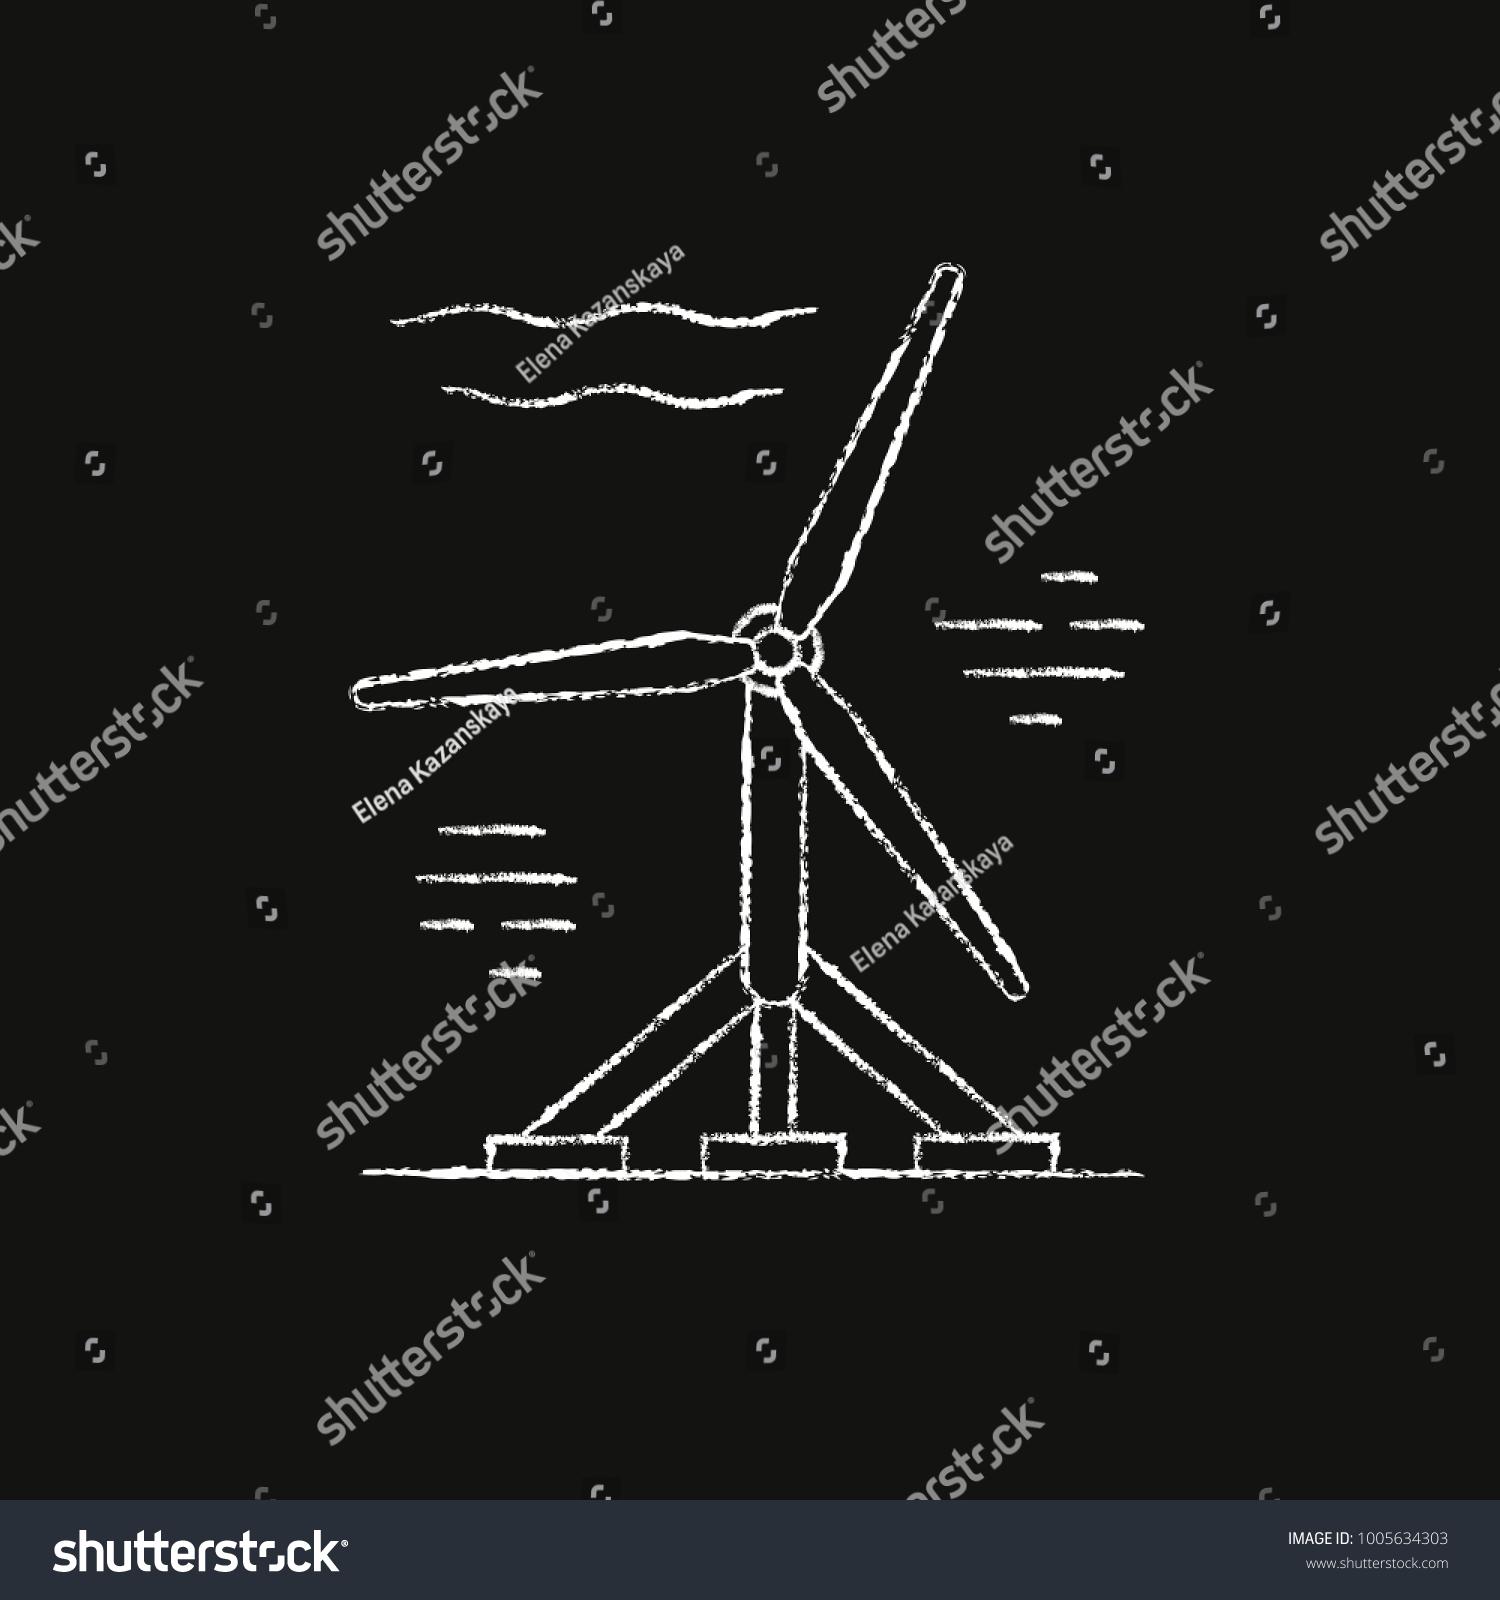 Tidal Energy Icon Sketch On Chalkboard Stock Illustration 1005634303